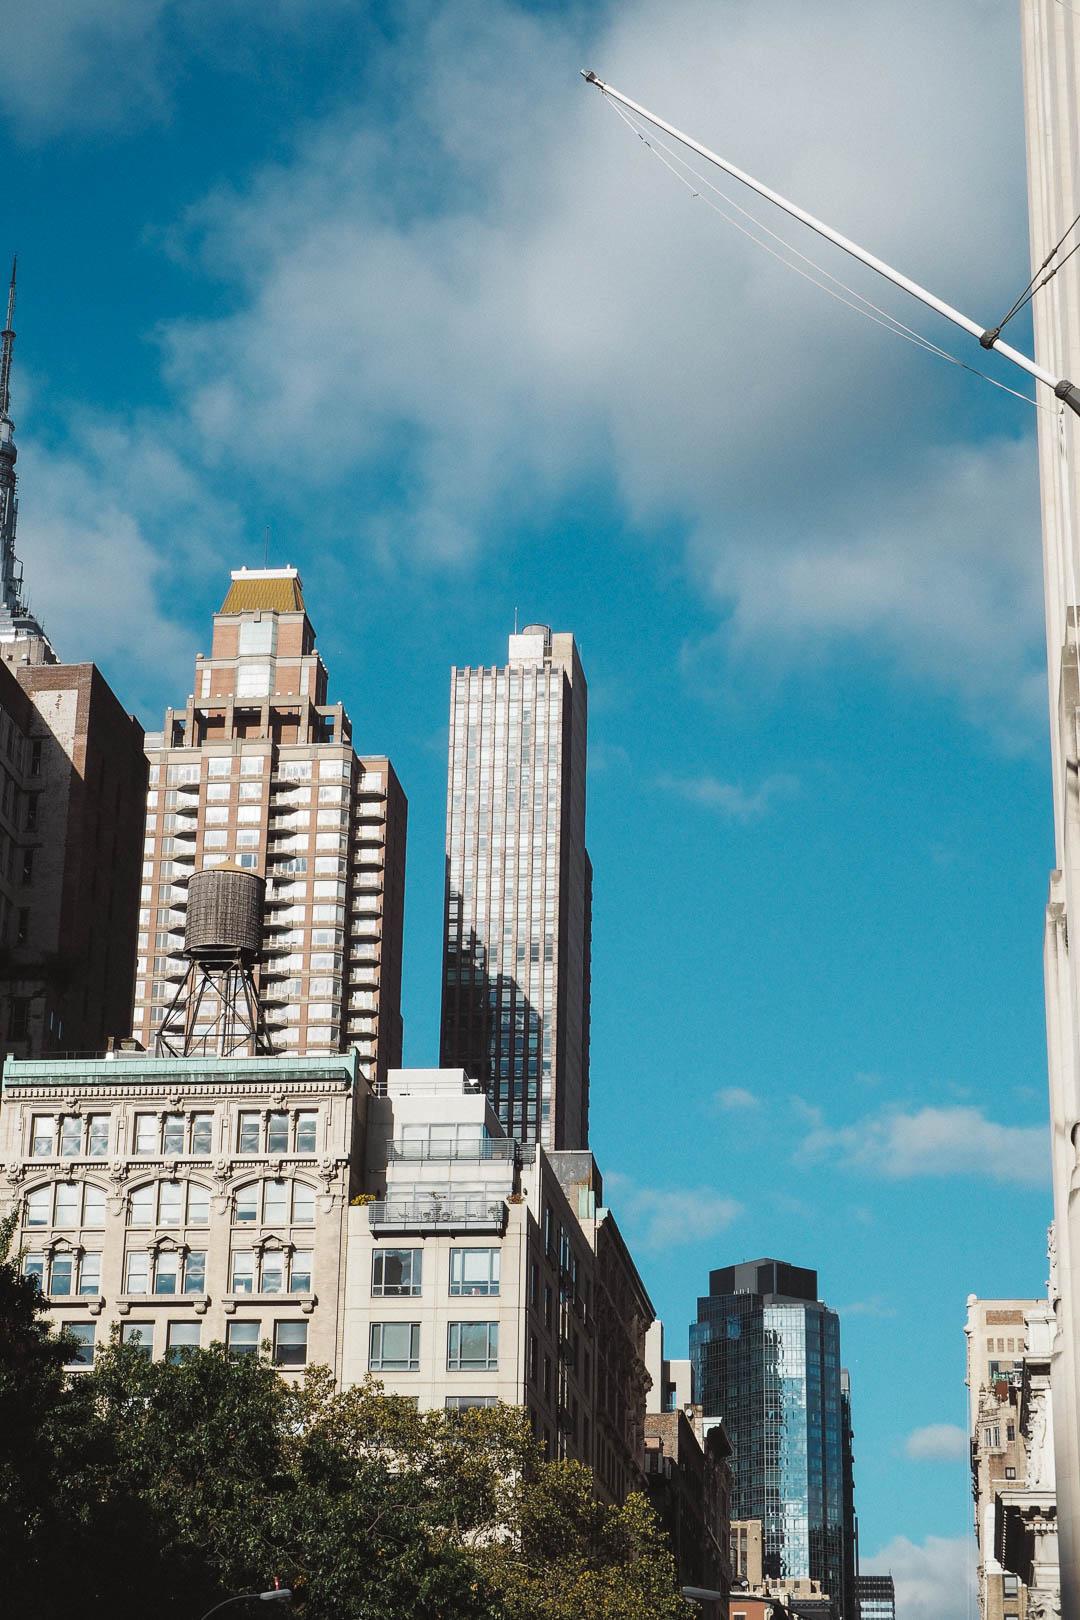 newyork-53-of-171